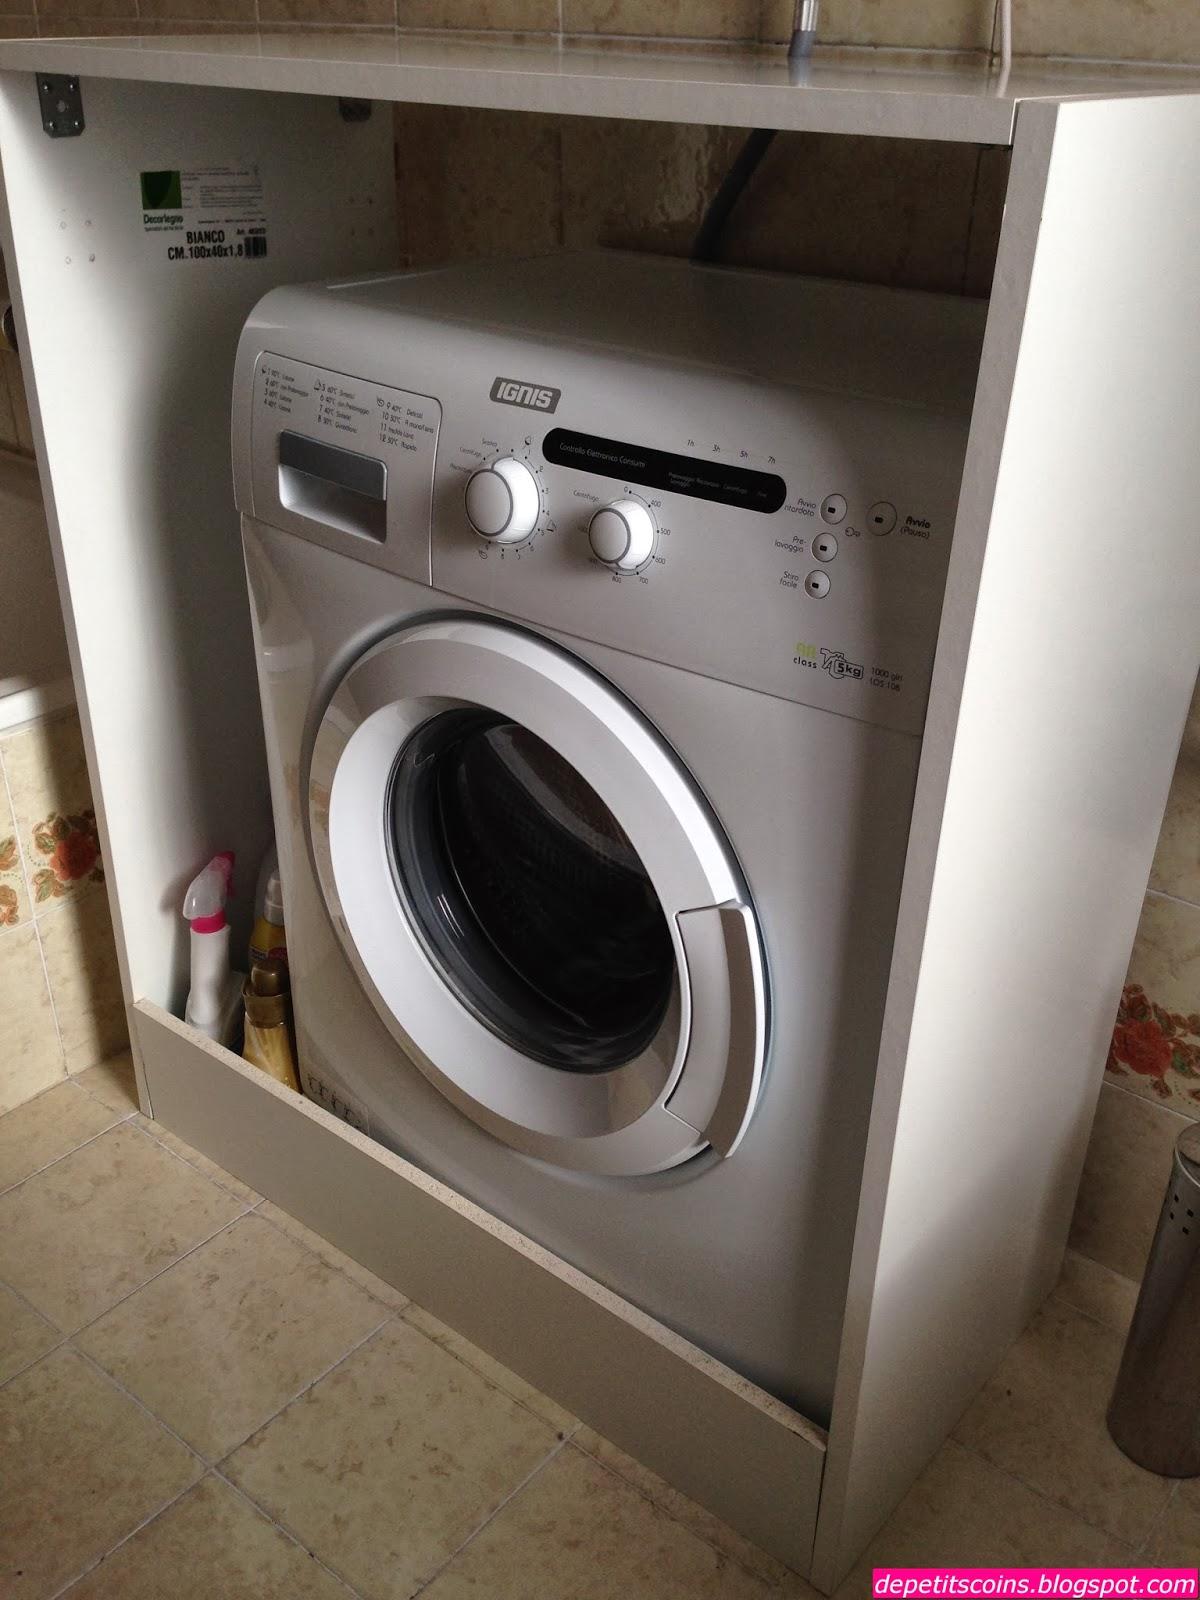 De Petits Coins: Mobile copri lavatrice